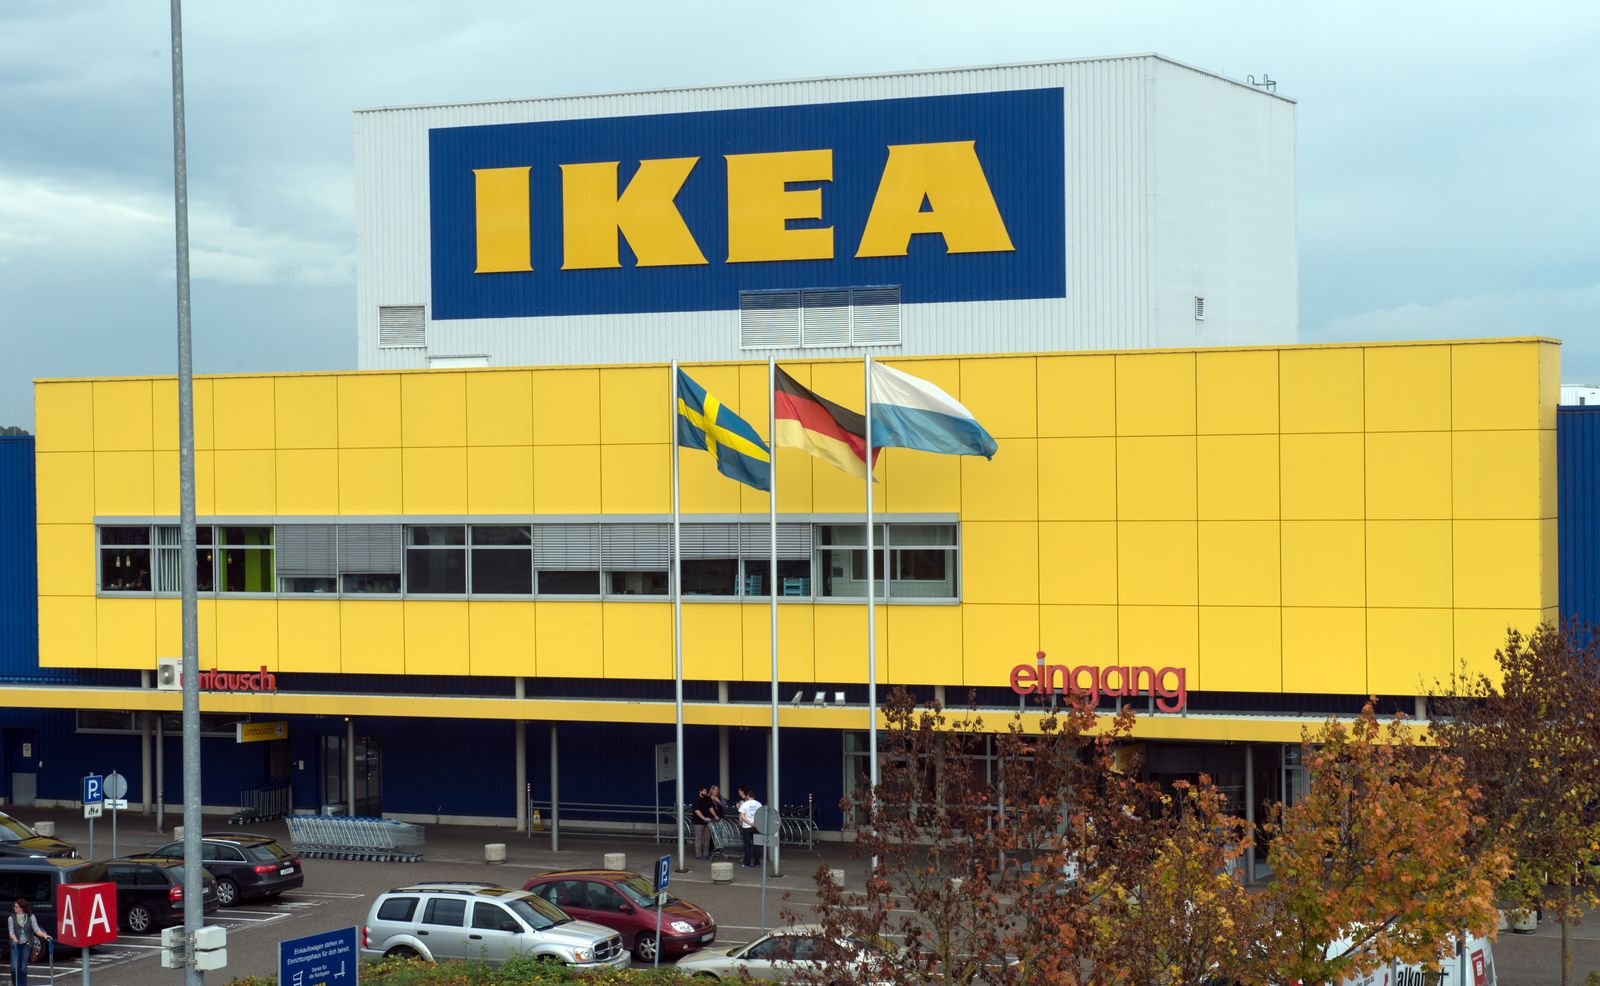 Ikea in Eching